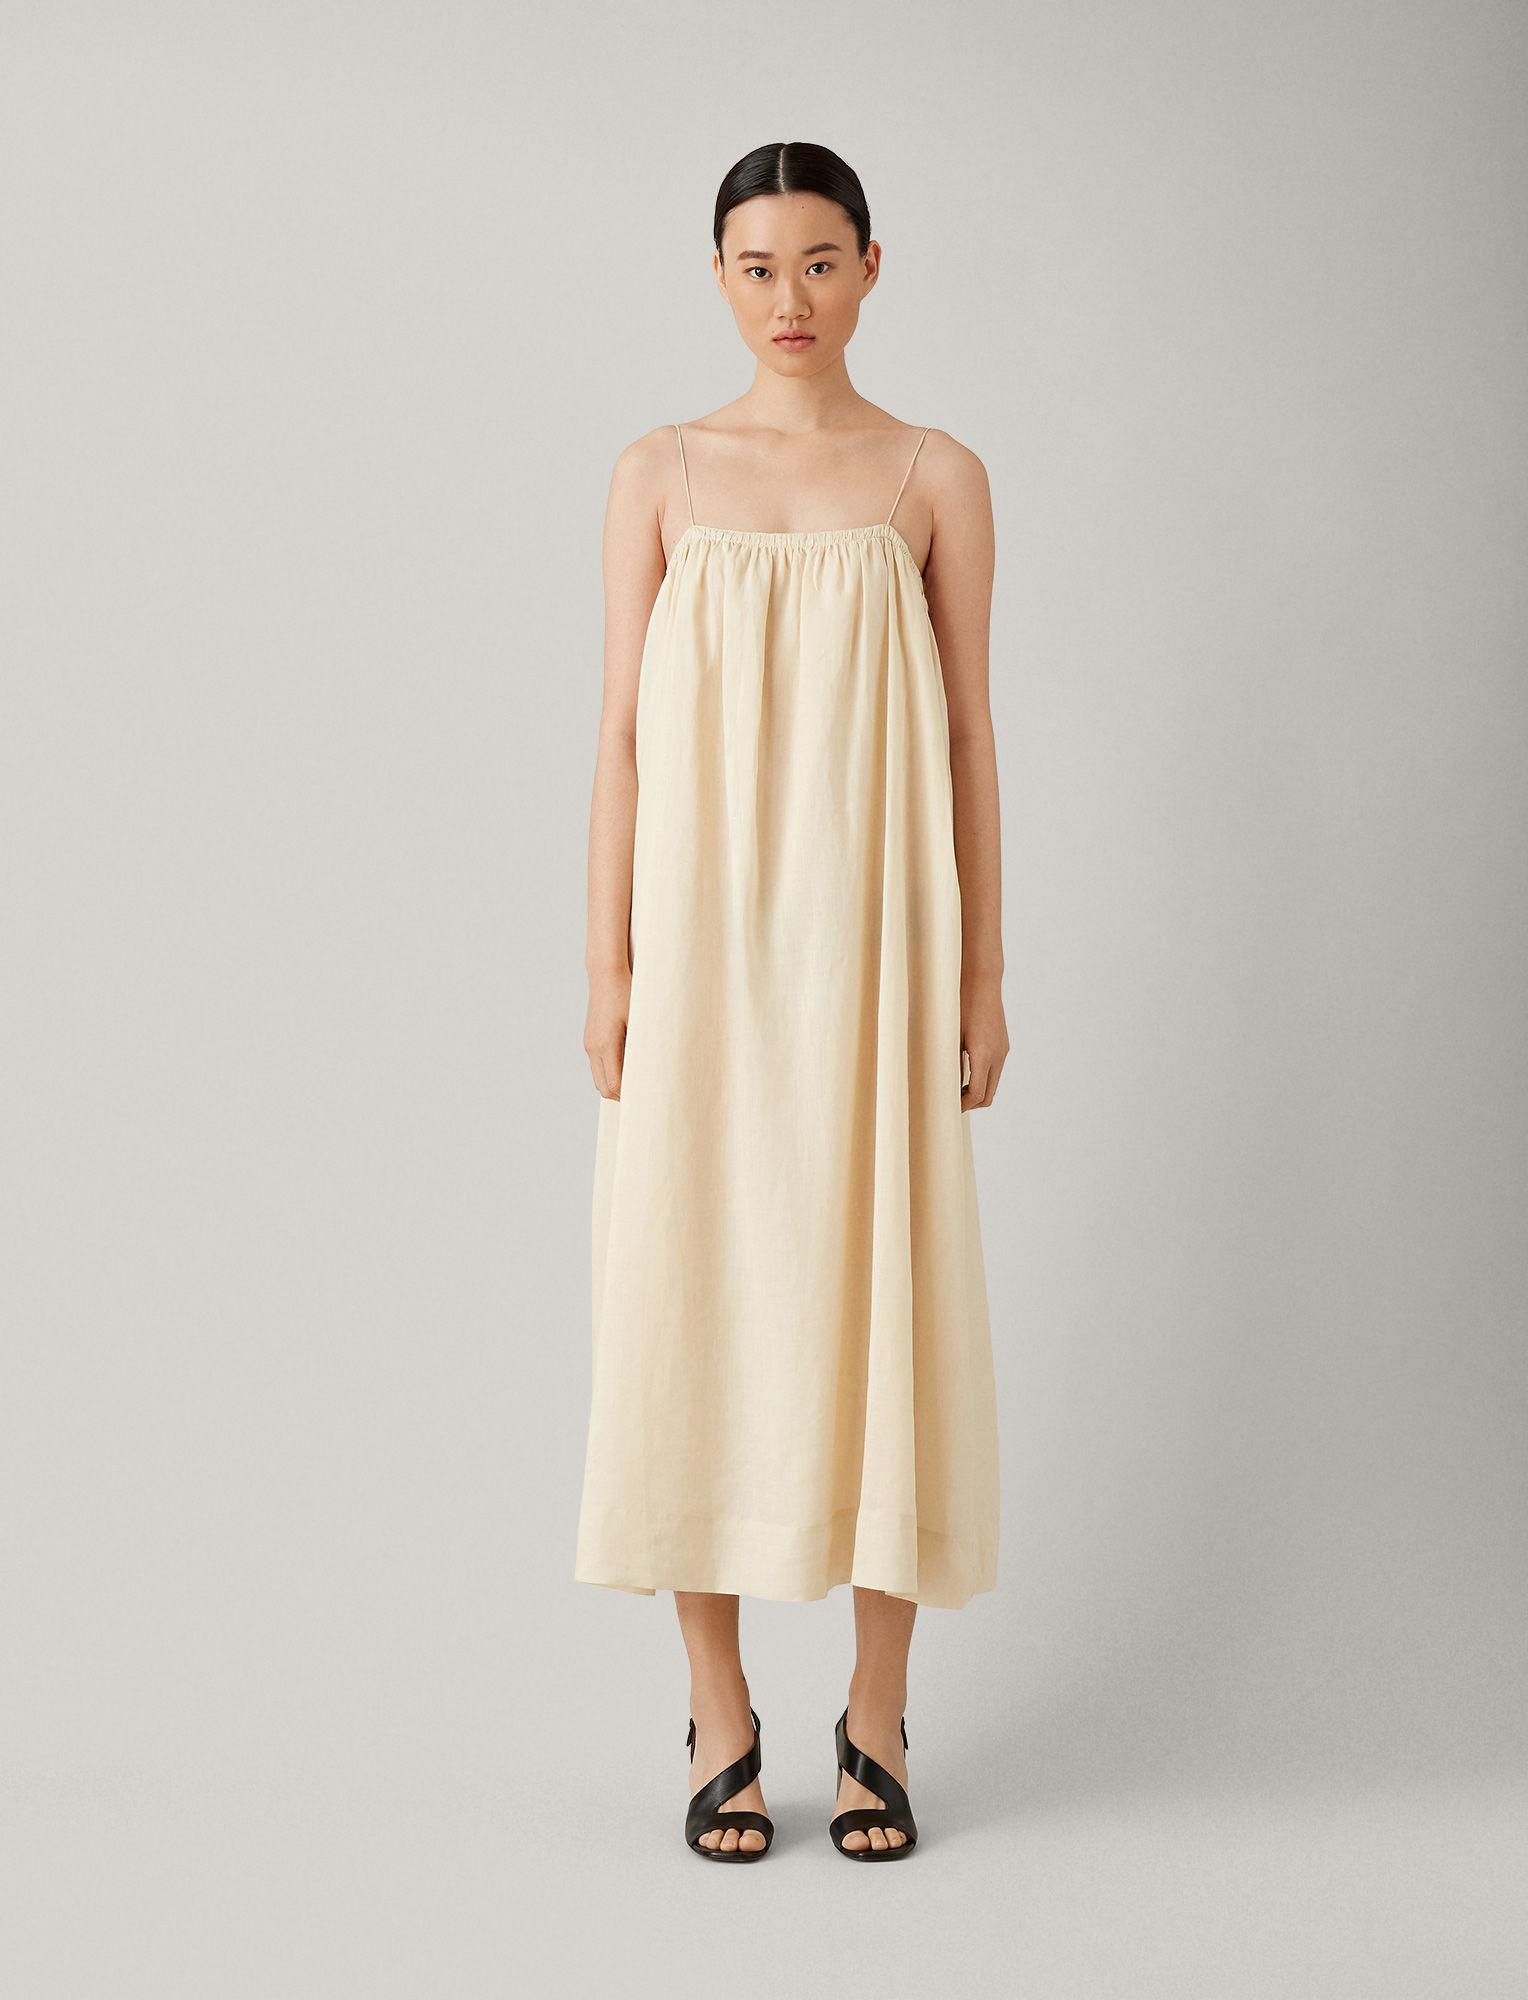 5f0a22e745f JOSEPH Tilda Ramie Voile Dress in Natural - Lyst